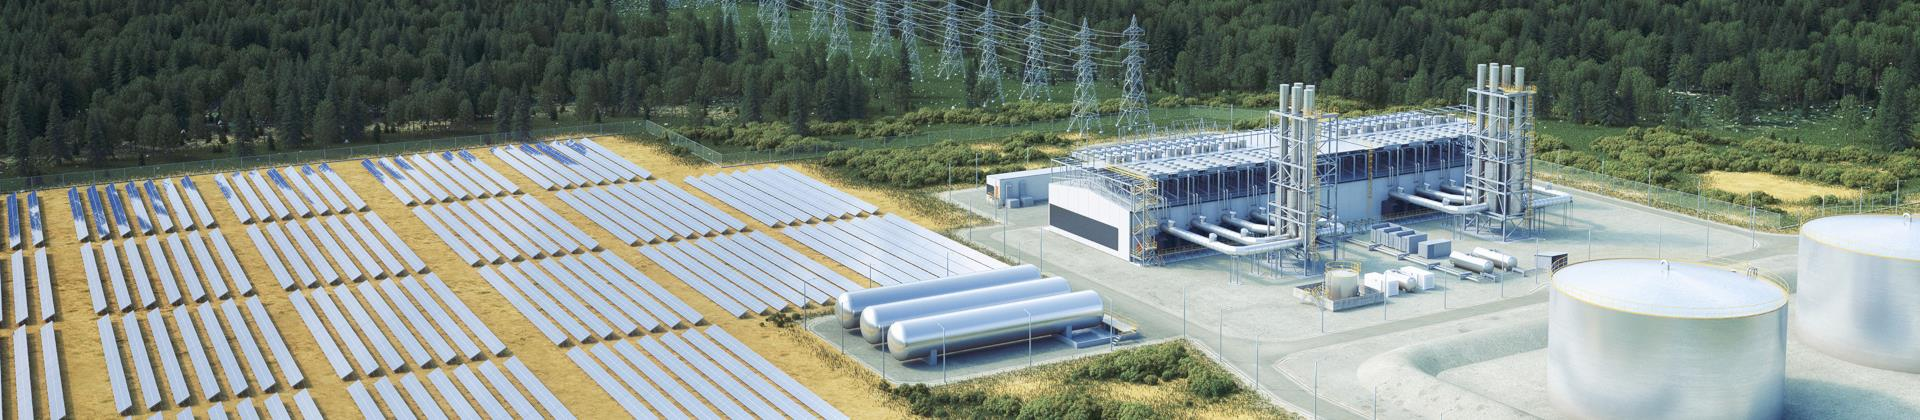 Energy System Integrator Daytime_test2